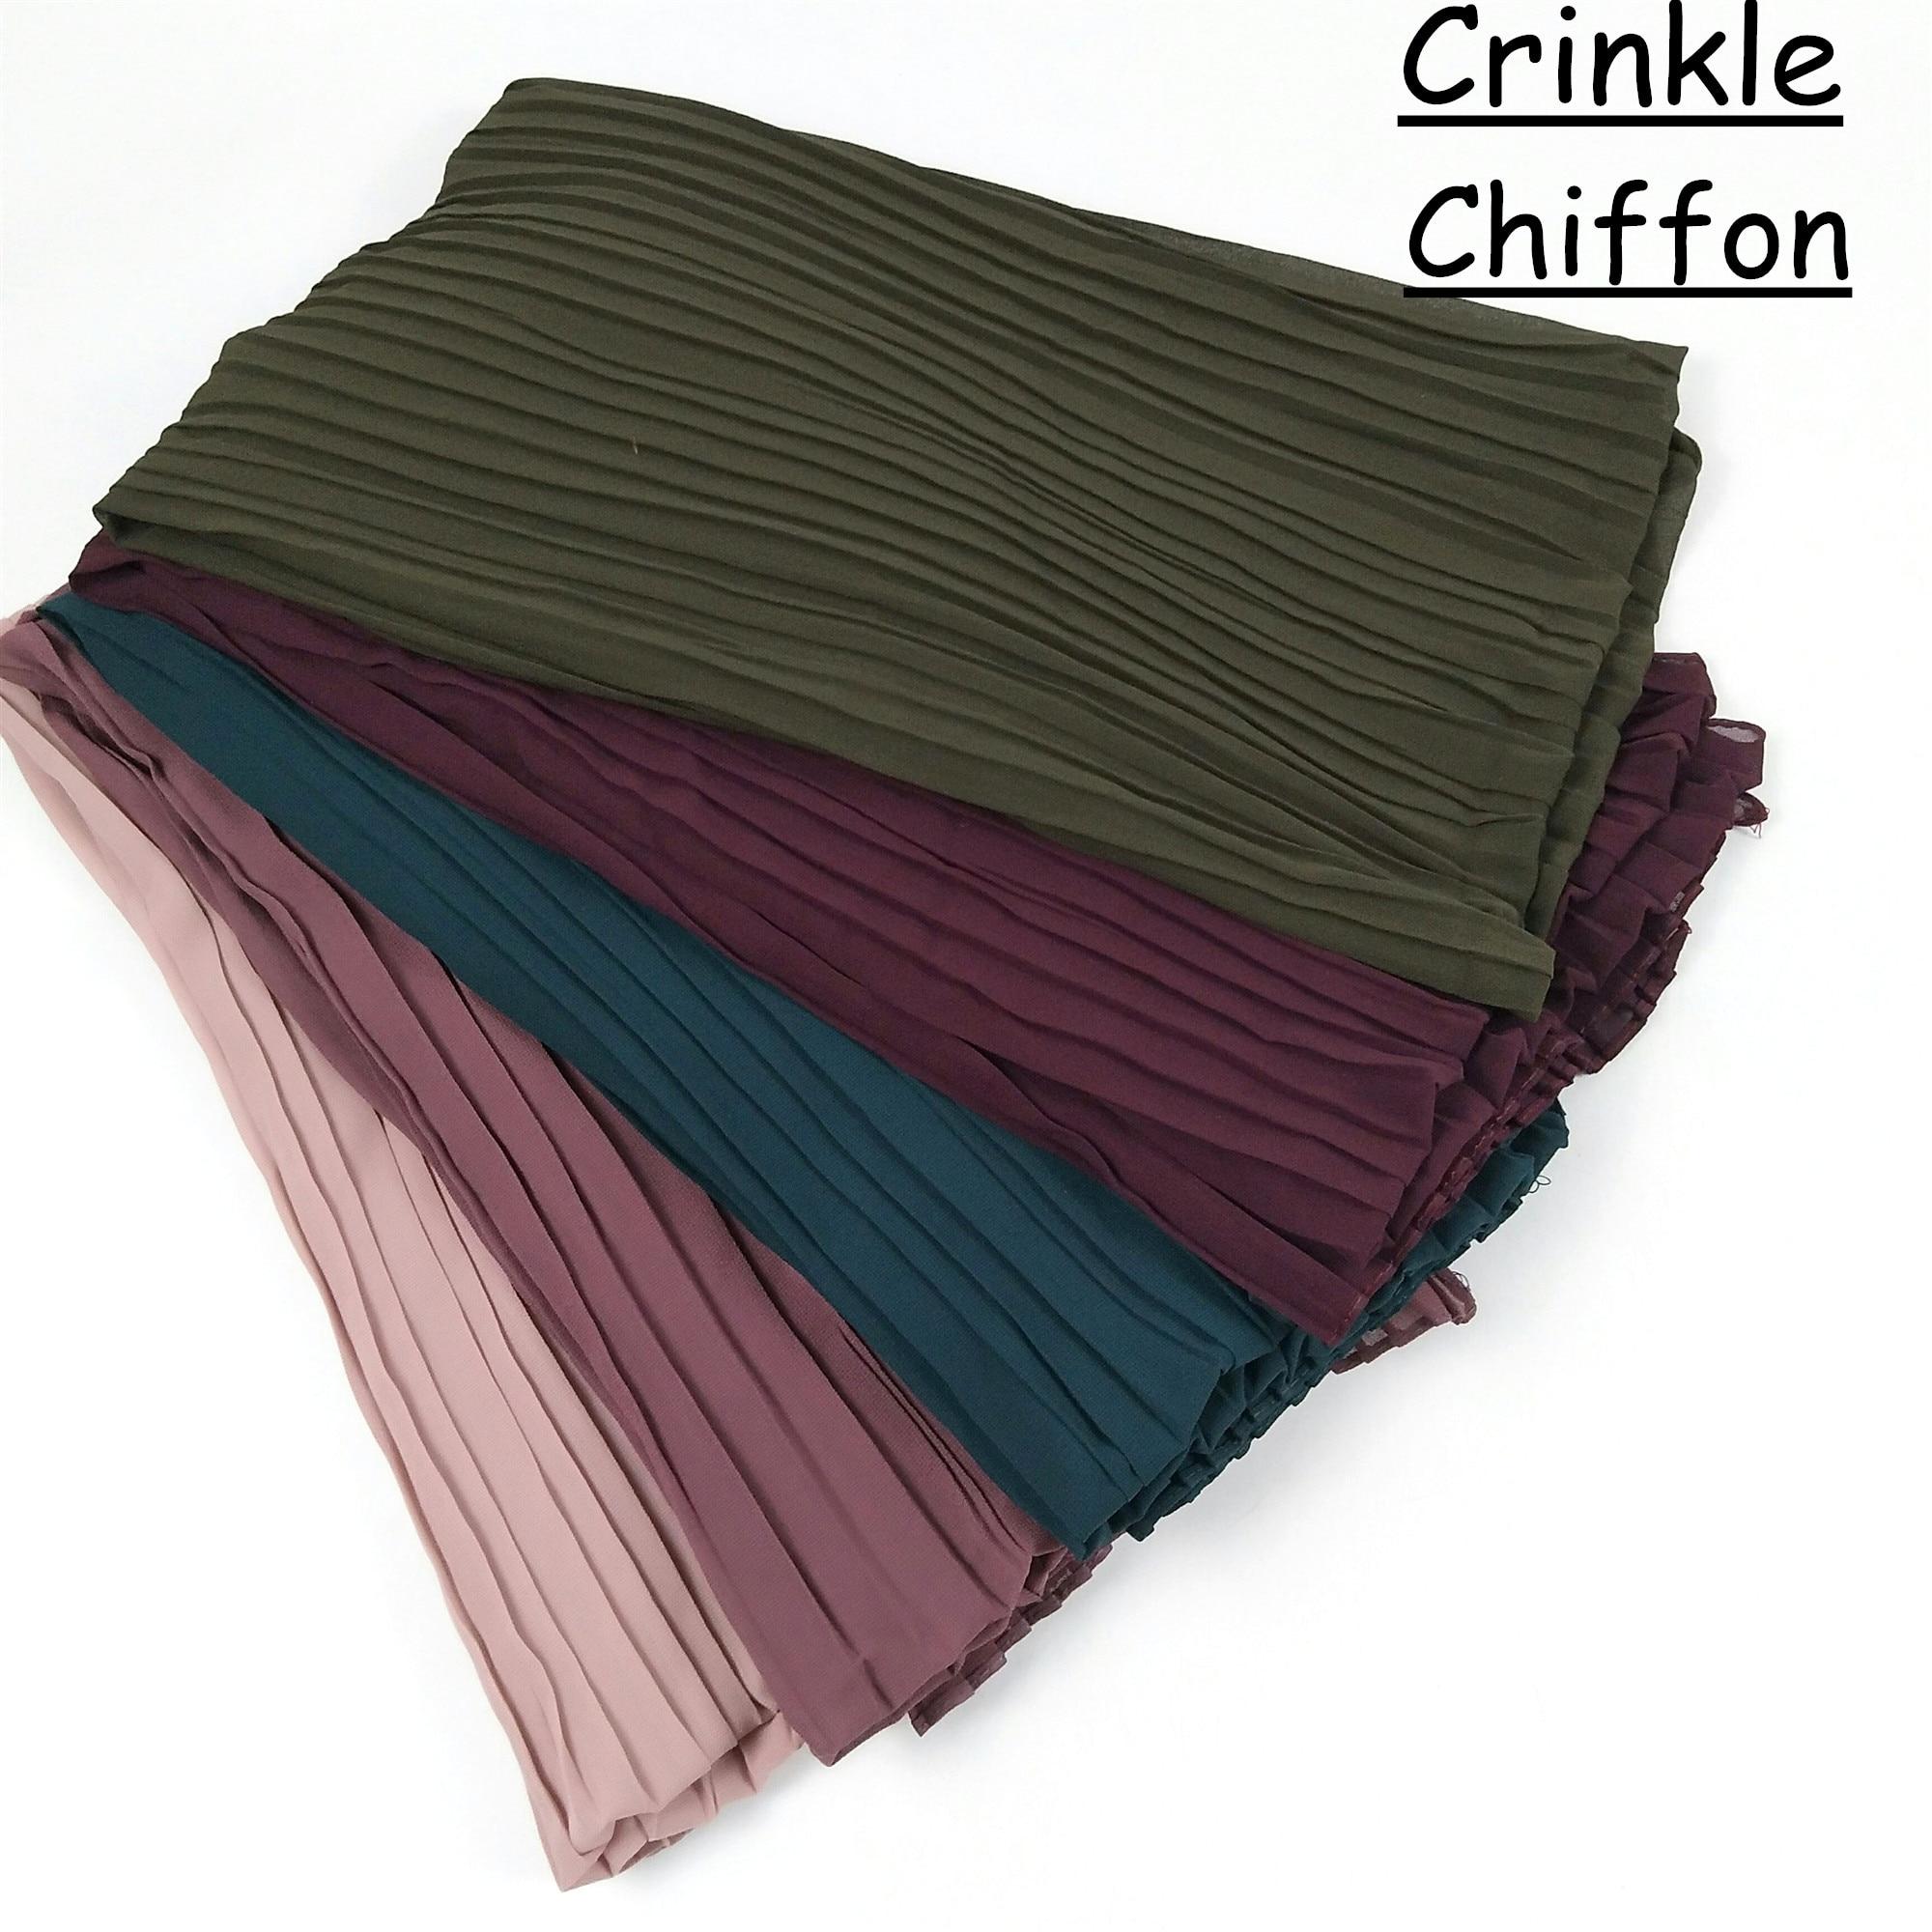 S94 High quality crinkle chiffon hijab   scarf     wrap   shawls chiffon hijab long   wrap   headband women   scarf  /  scarves   10pcs/lot